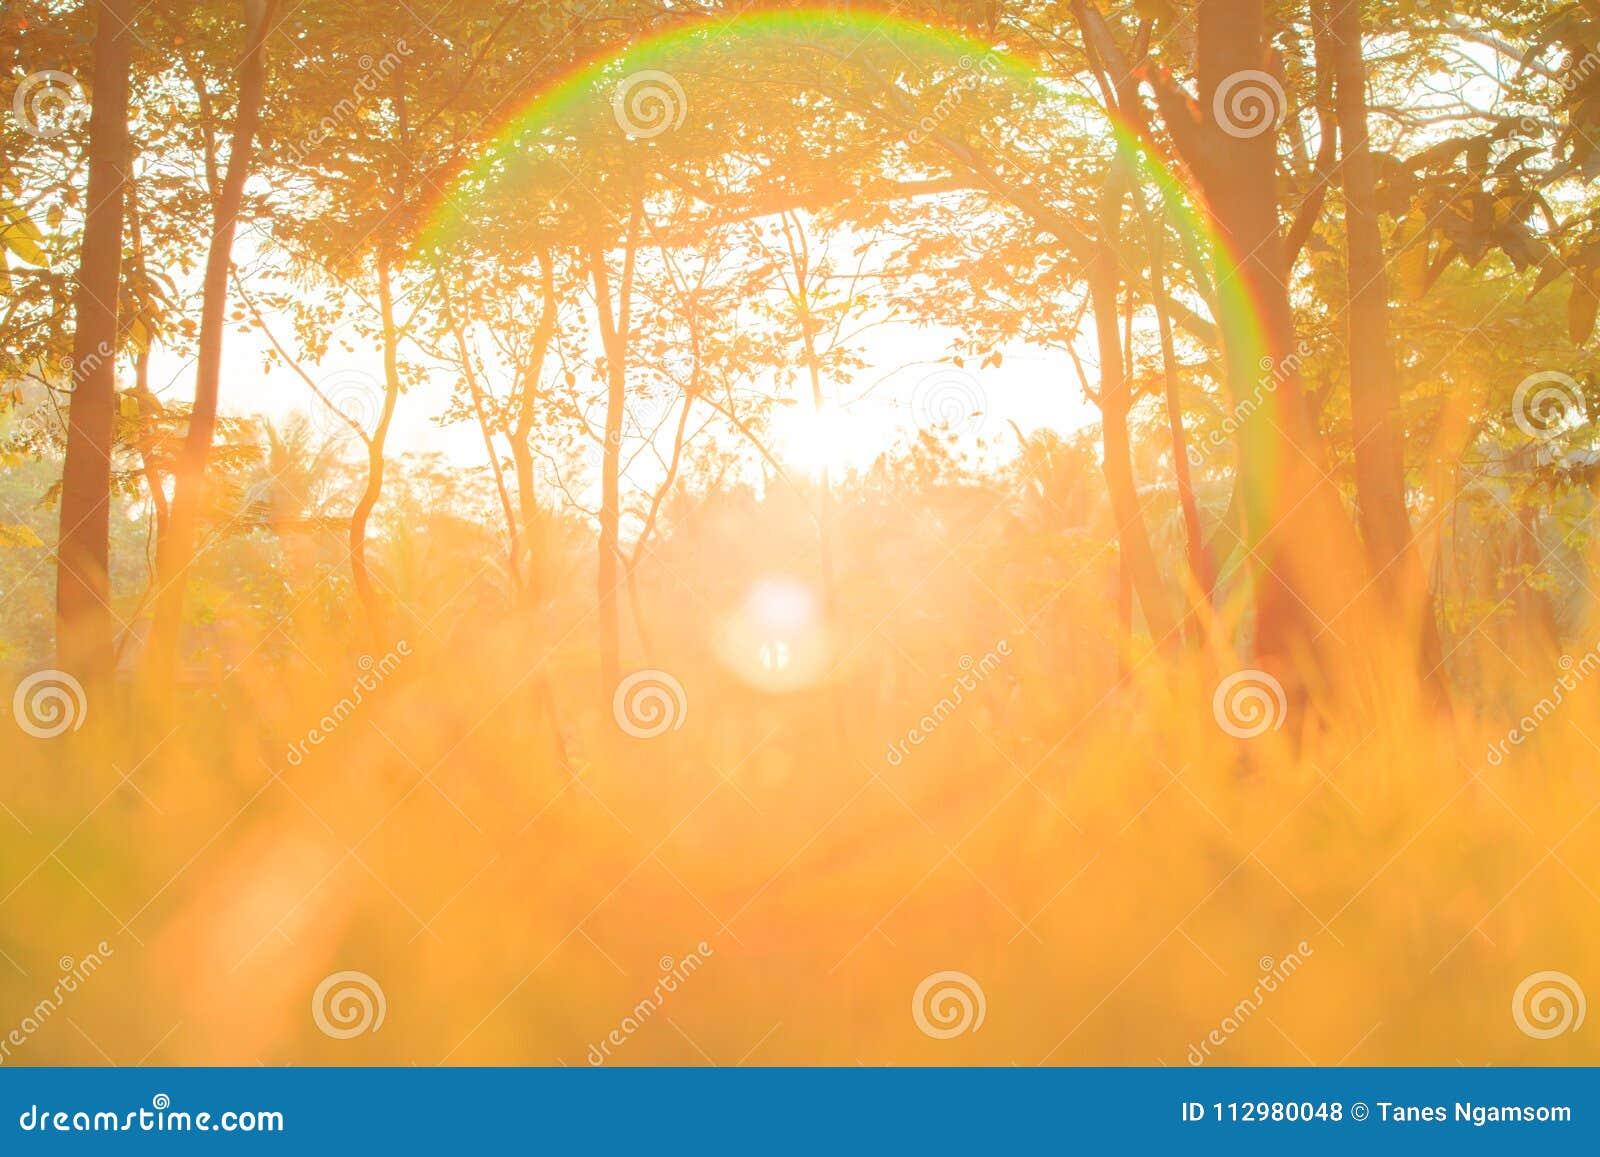 Golden sunrise shines down around the tree and grassland.